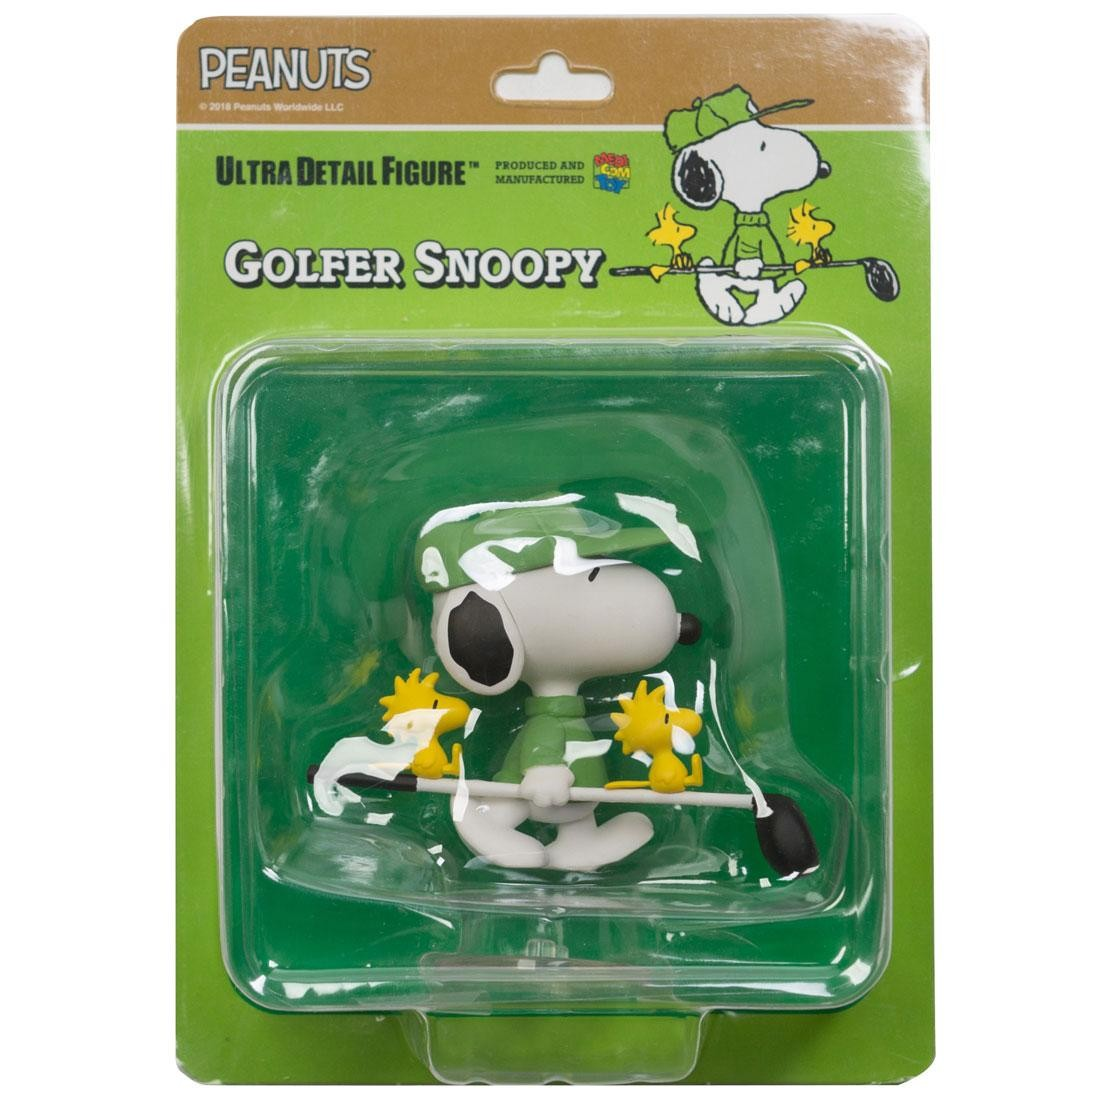 Medicom UDF Peanuts Series 8 Golfer Snoopy Ultra Detail Figure (green)